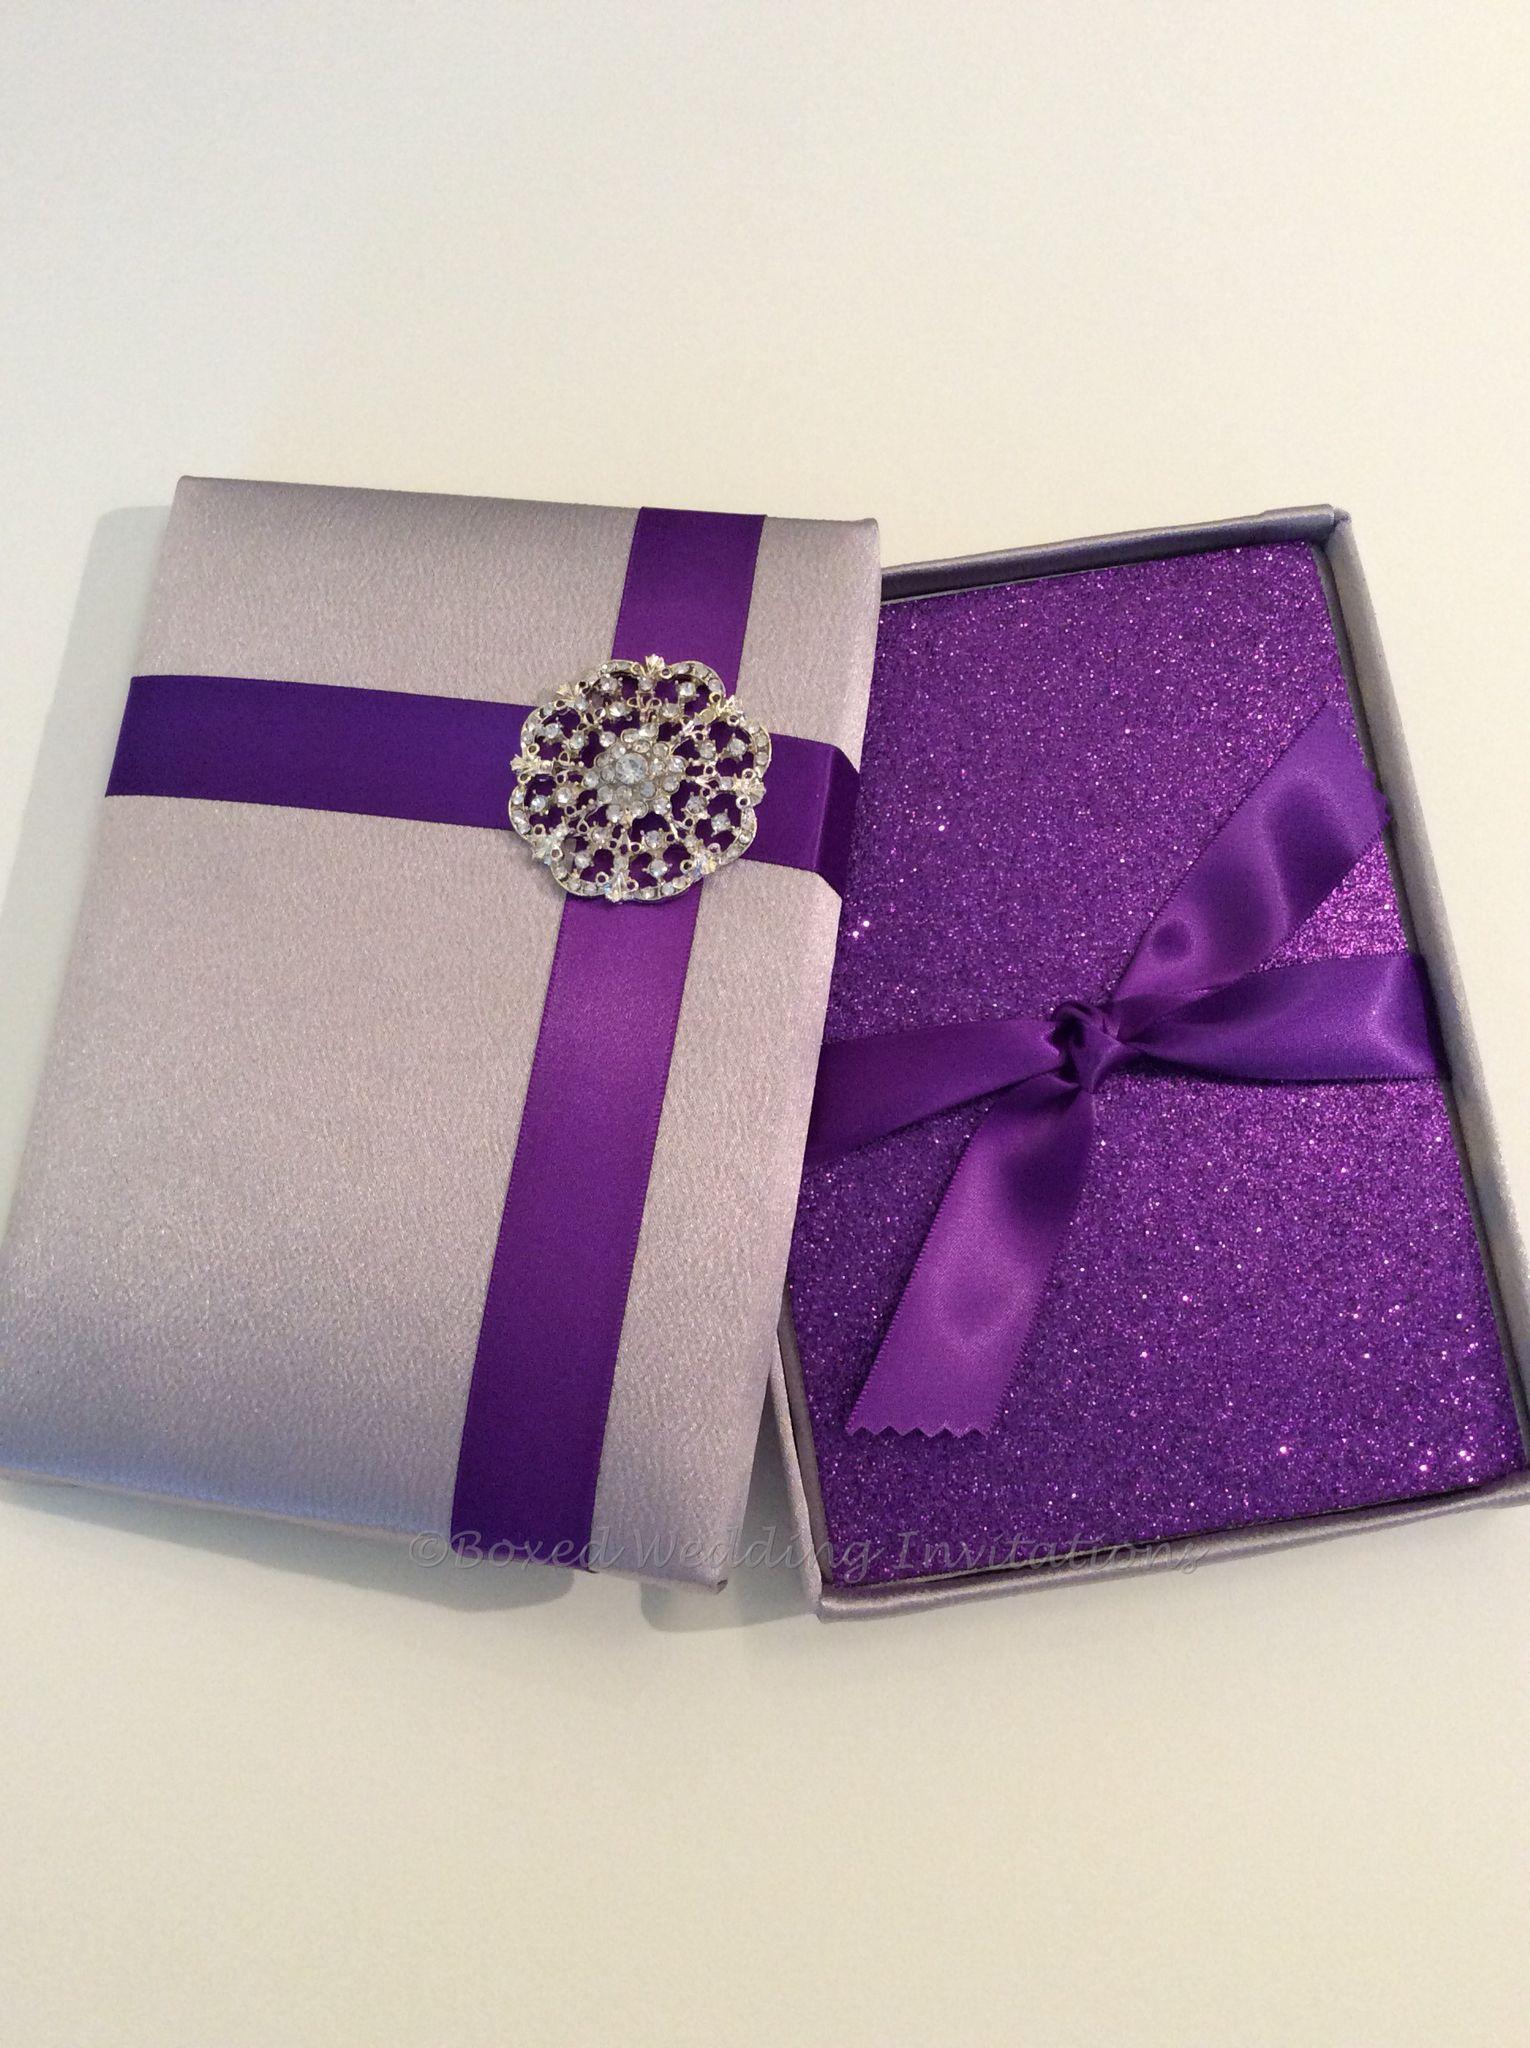 boxedweddinginvitationscom Couture Wedding InvitationsUnique luxury silk